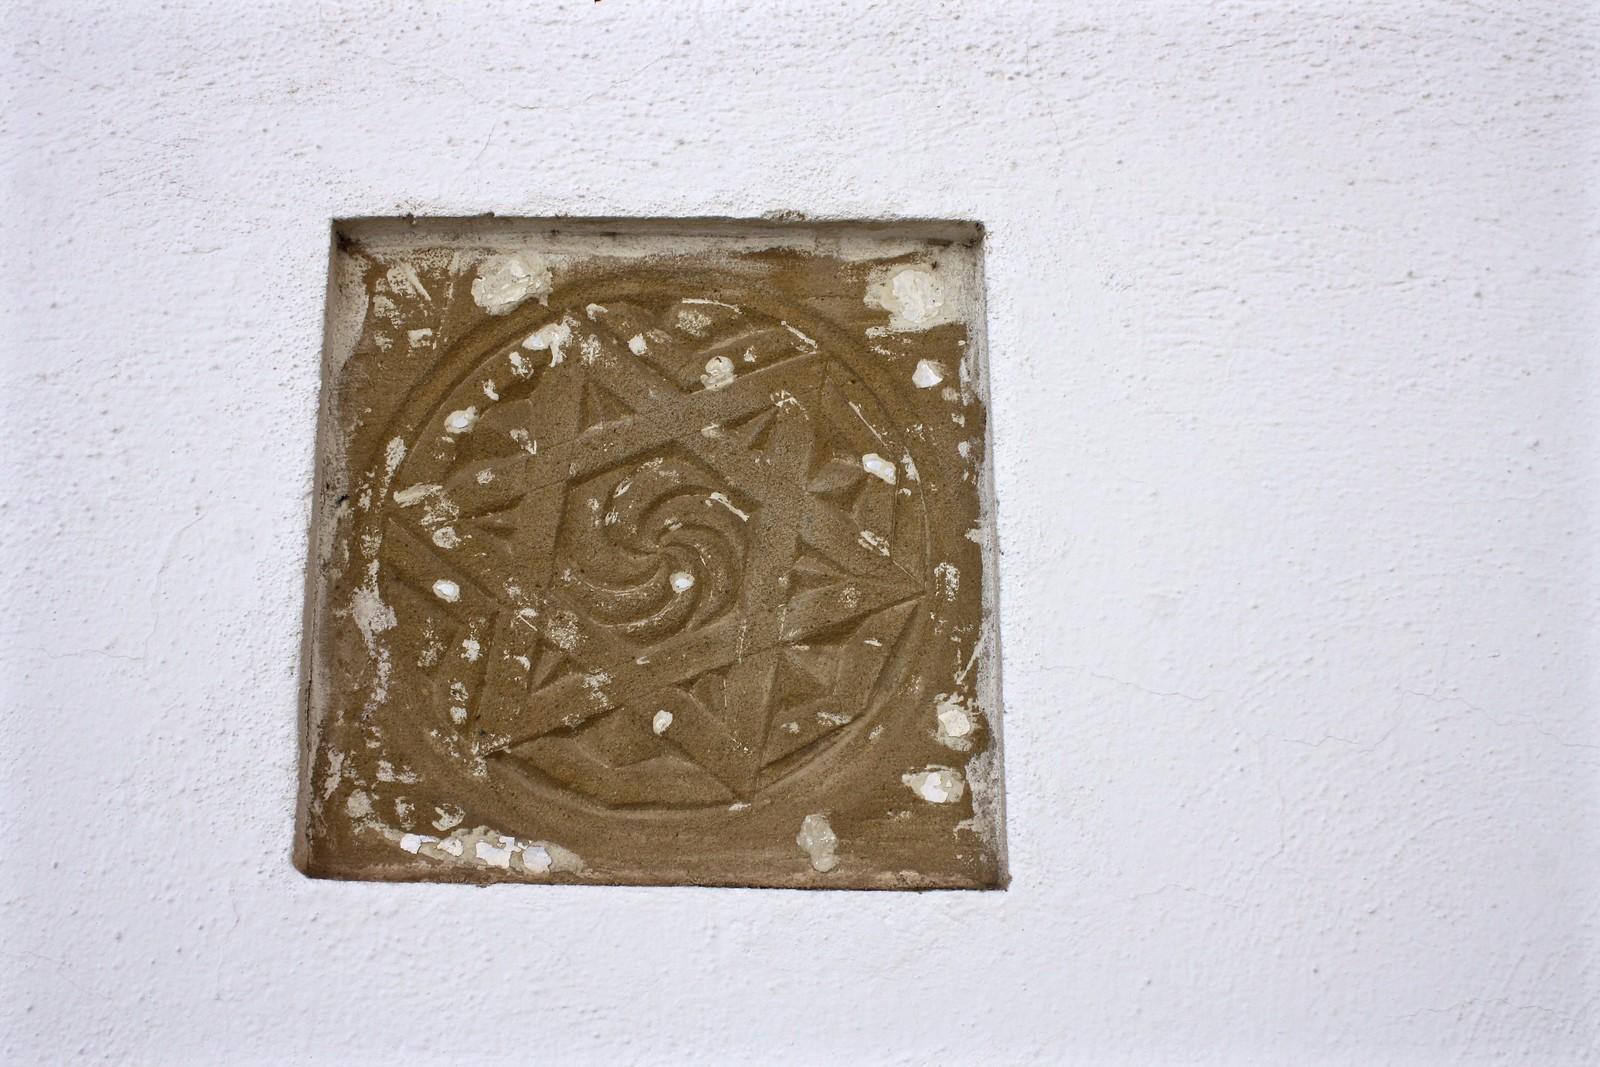 Star of David in the Jewish quarter of Jaén, Spain